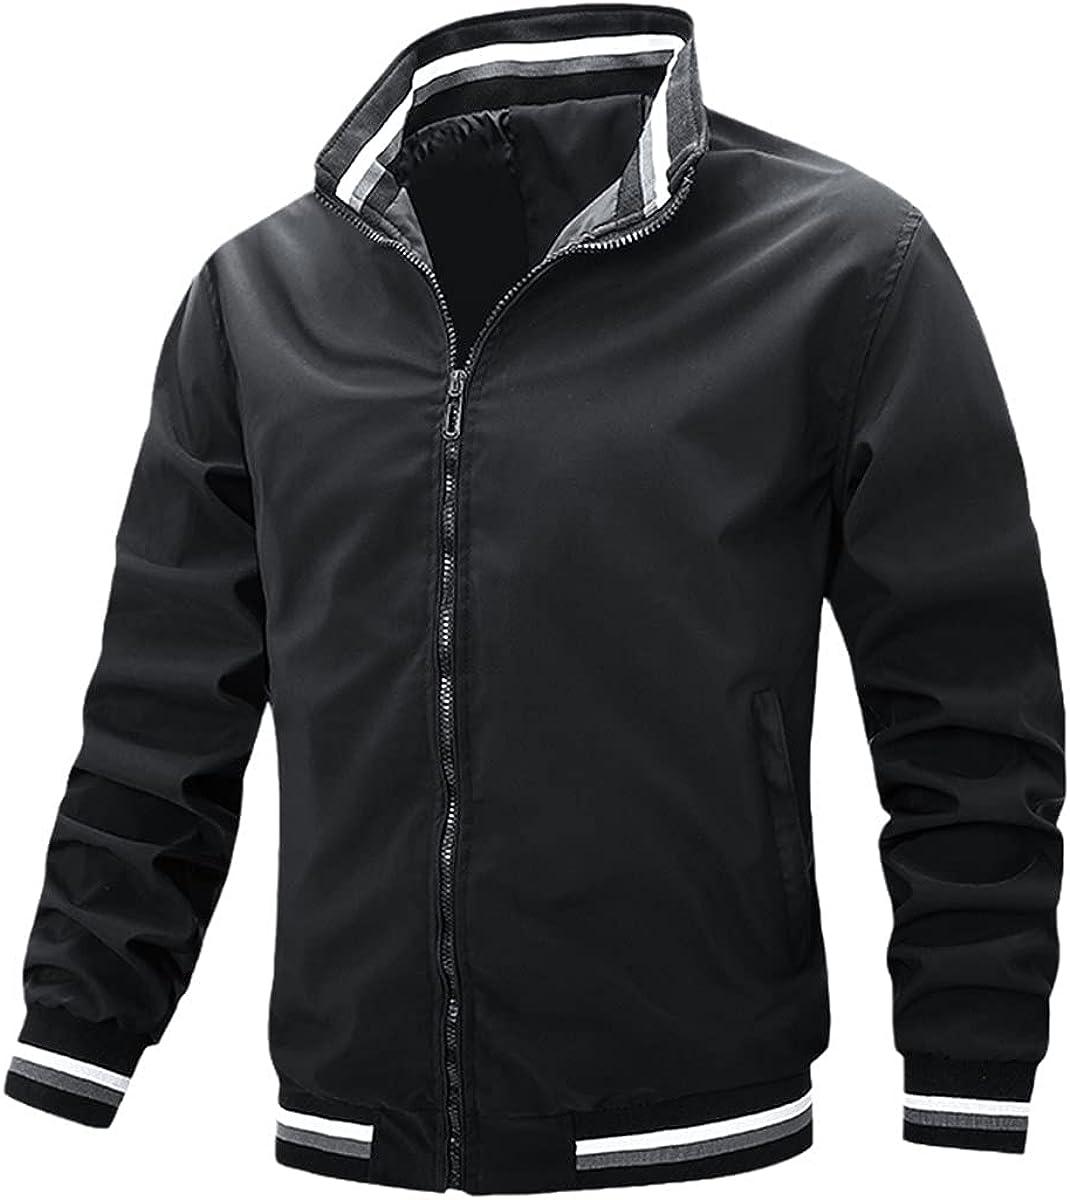 Spring Men's White Casual Jacket Fashion Windbreaker Bomber Jacket Men's Military Uniform Jacket